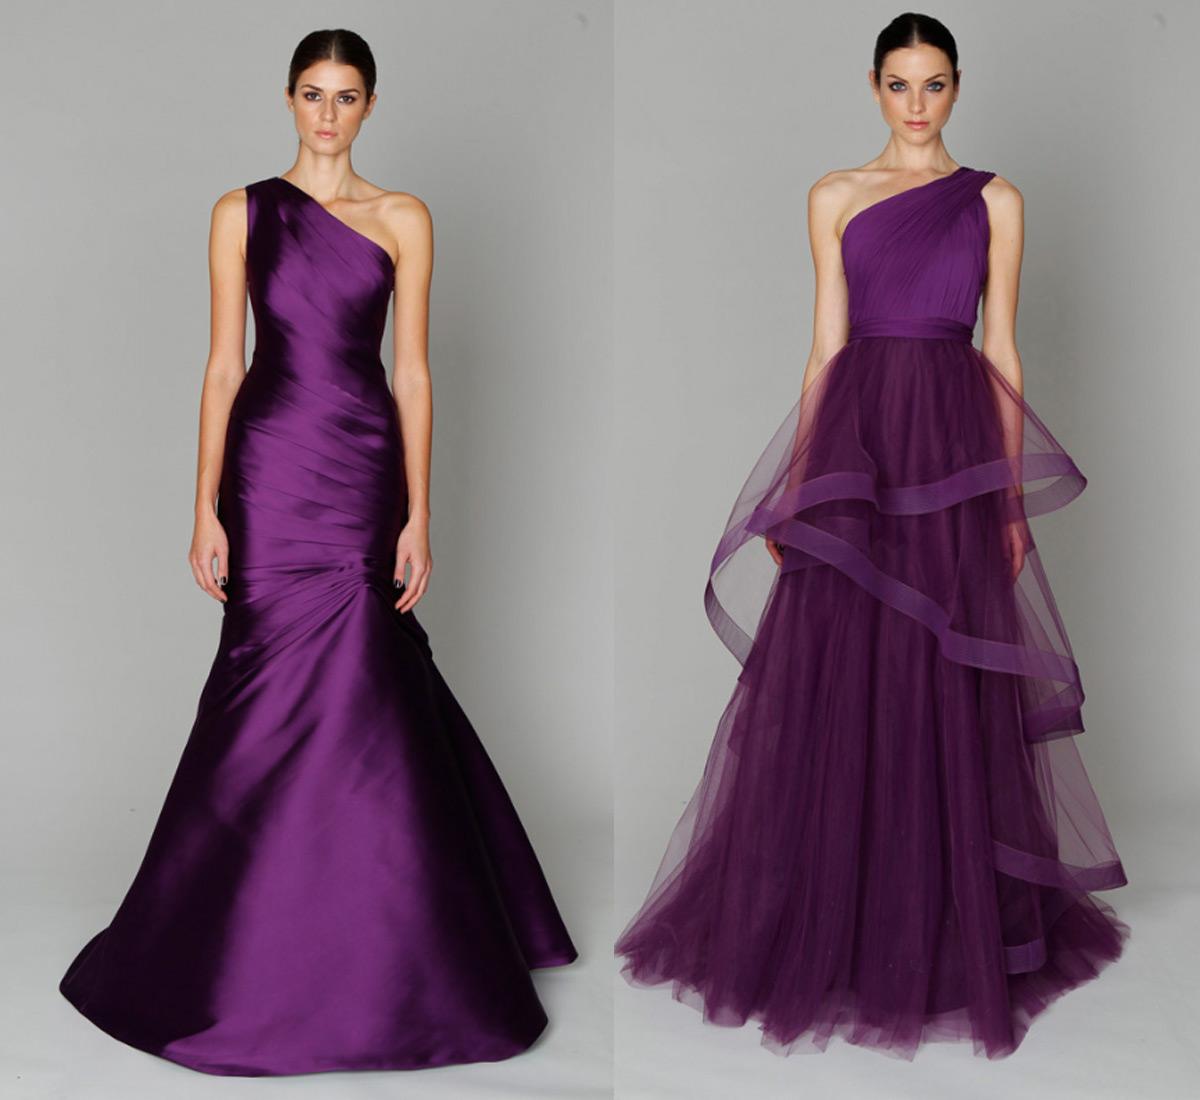 Discount Evening Gowns: Cheap Wedding Gowns Online Blog: Monique Lhuillier Evening